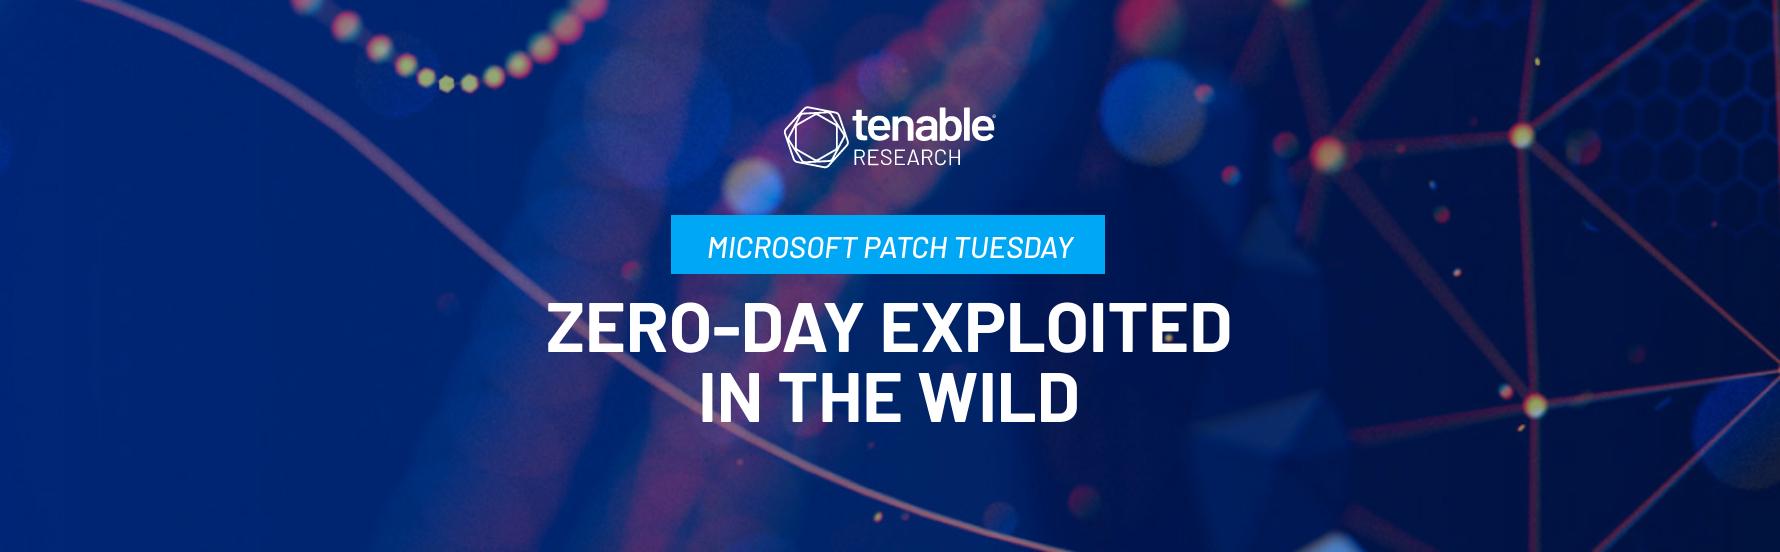 Microsoft's September 2021 Patch Tuesday Addresses 60 CVEs (CVE-2021-40444)